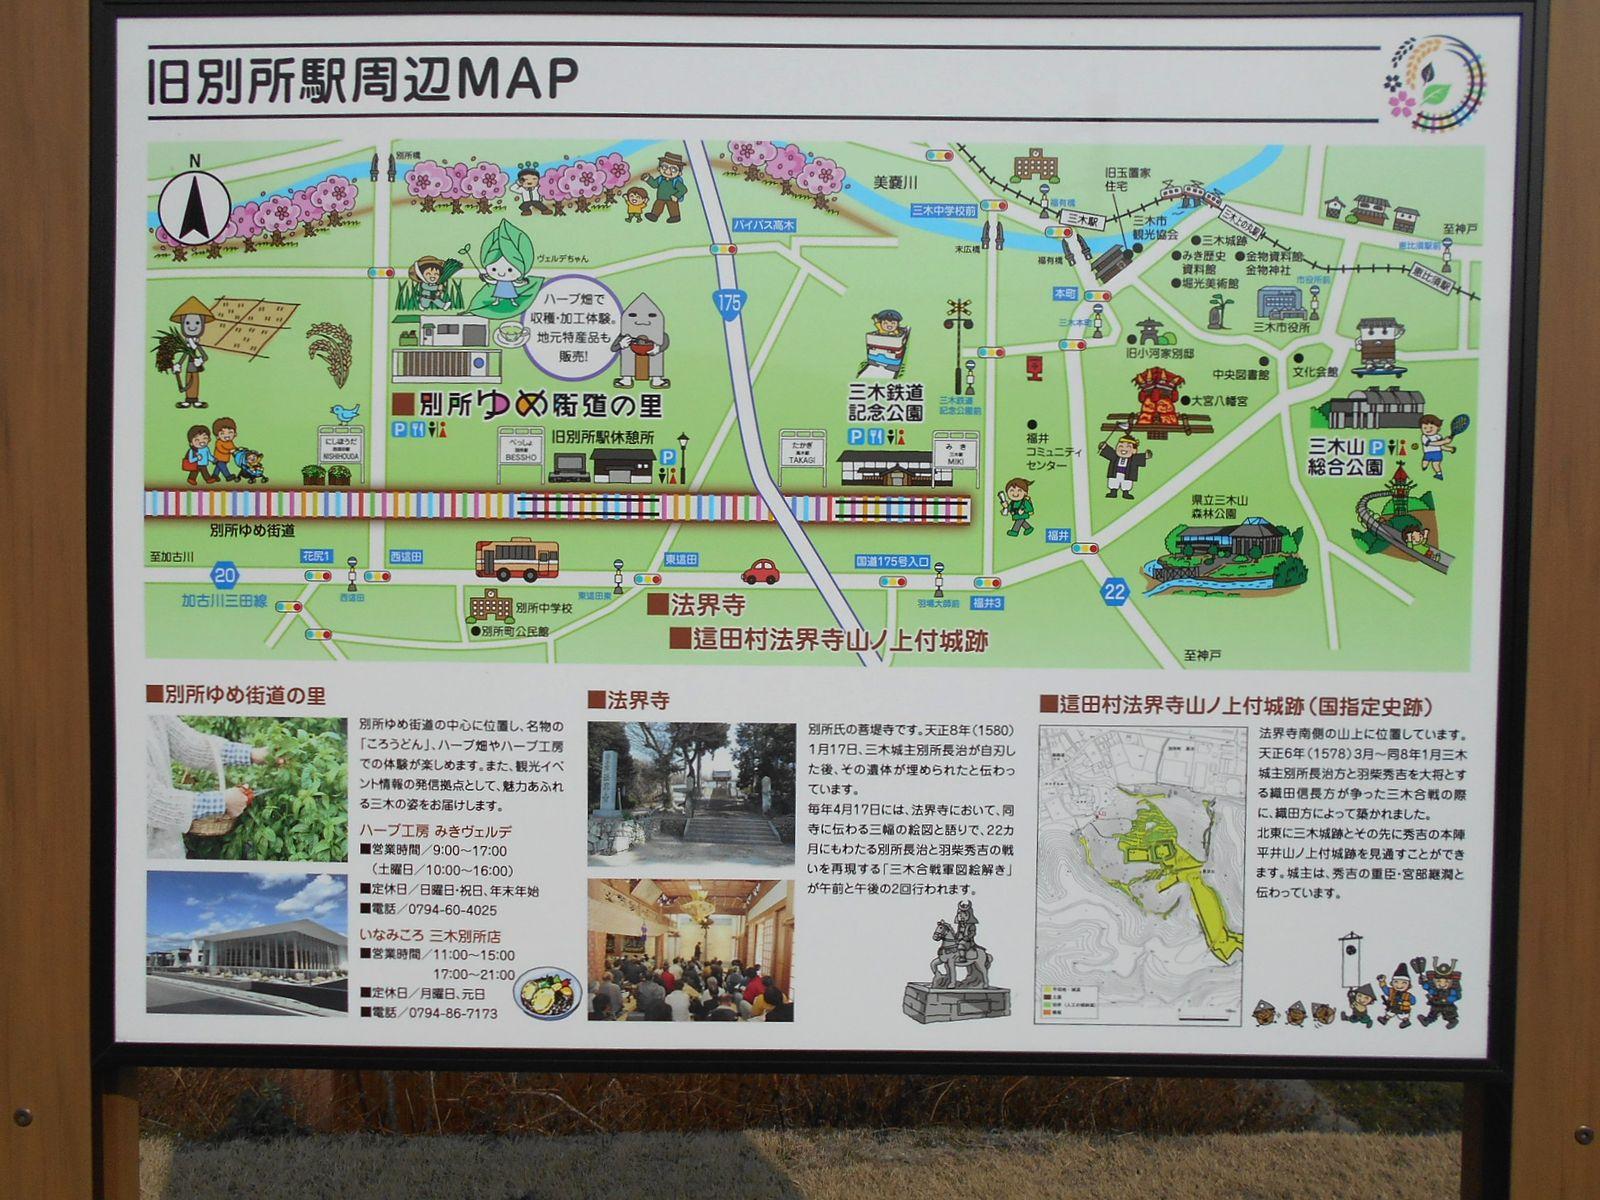 別所ゆめ街道 遊歩道 別所駅跡